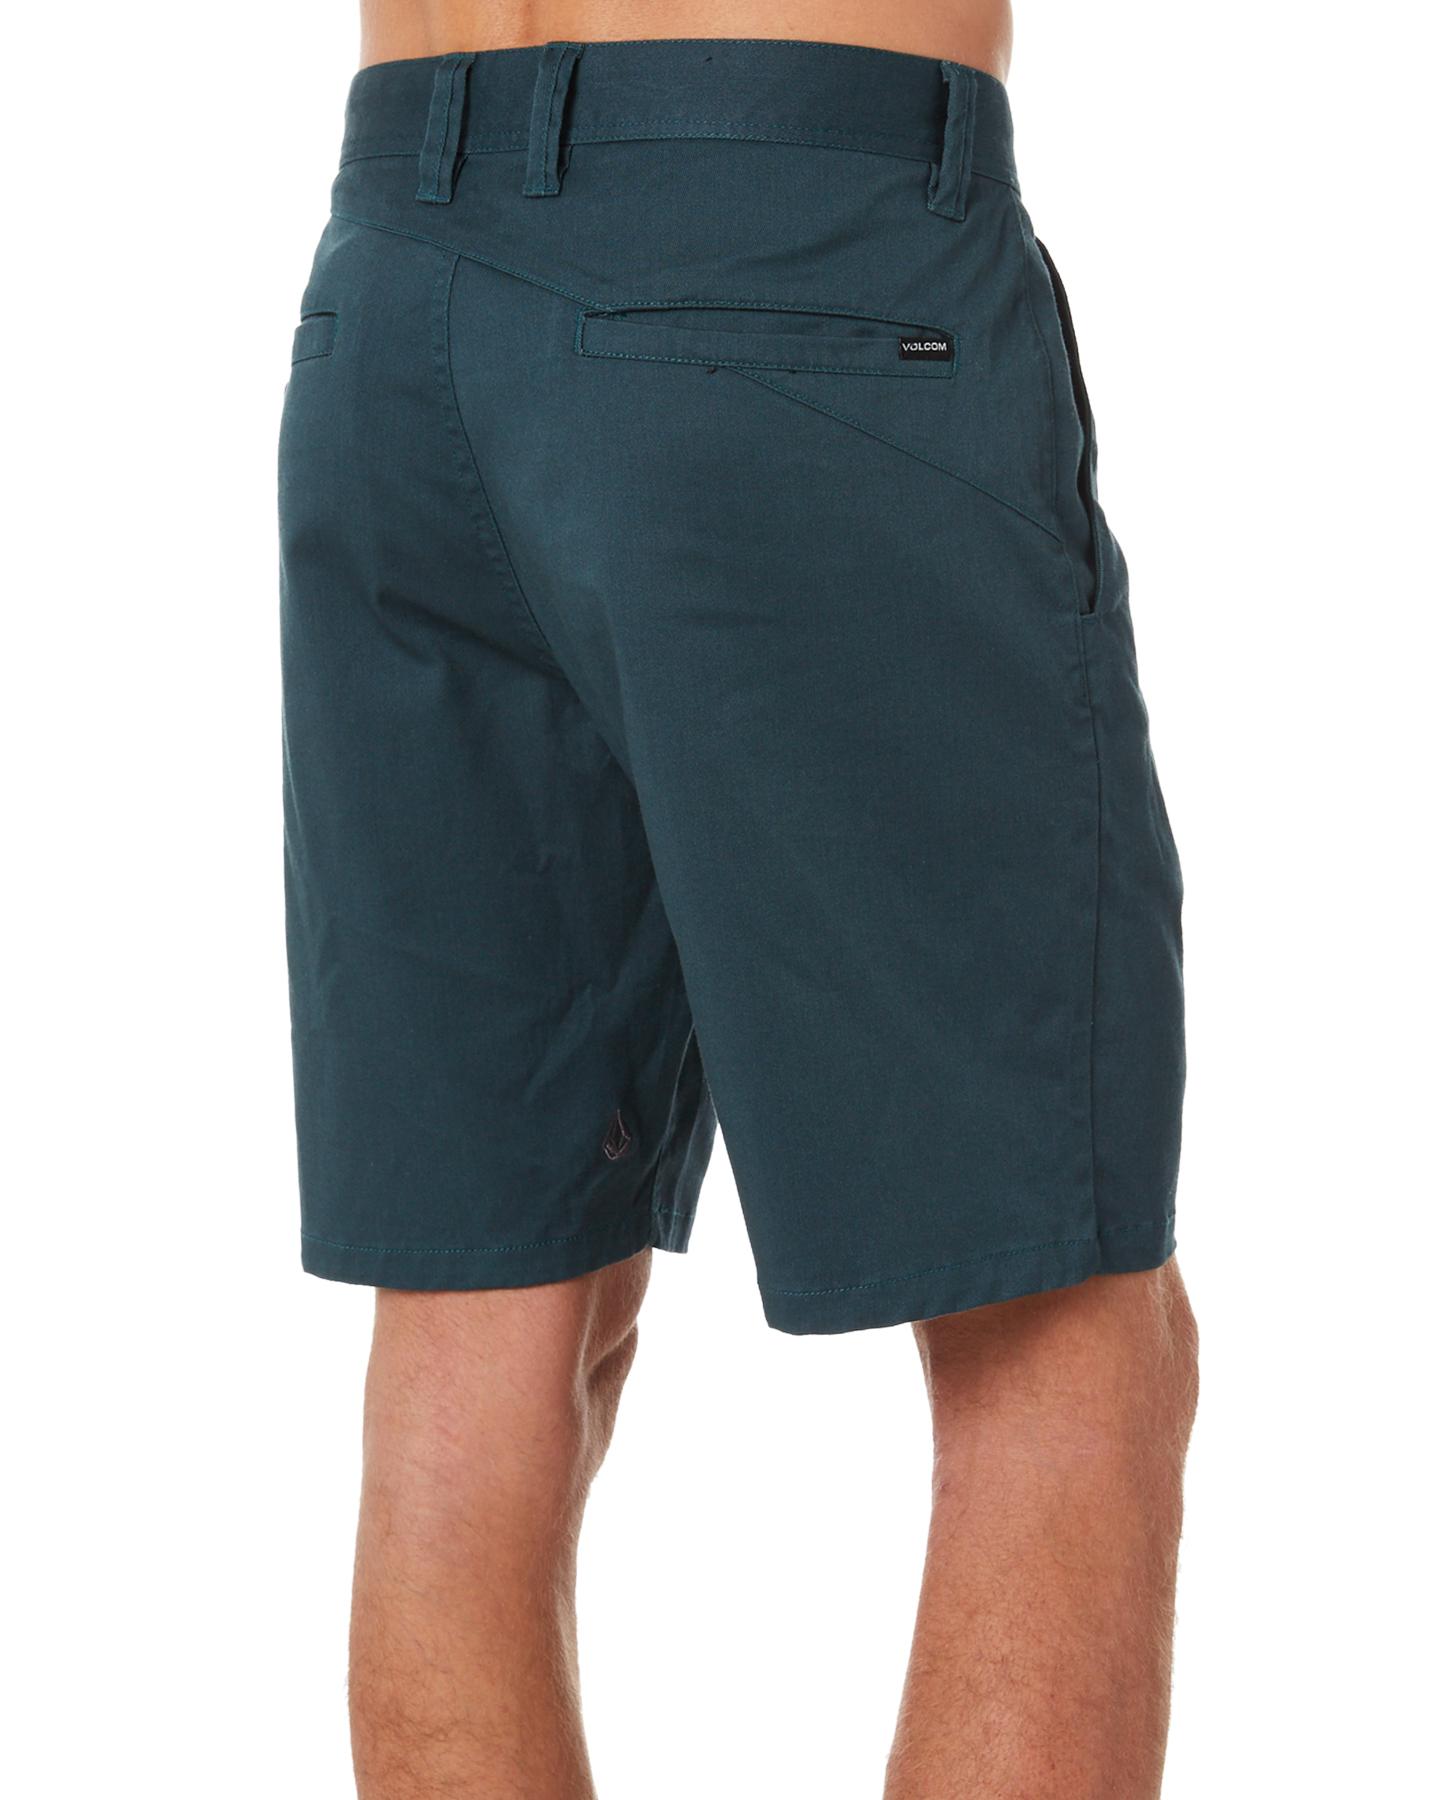 83d18284 New Volcom Men's Frickin Modern Stretch 19 Mens Short Blue | eBay